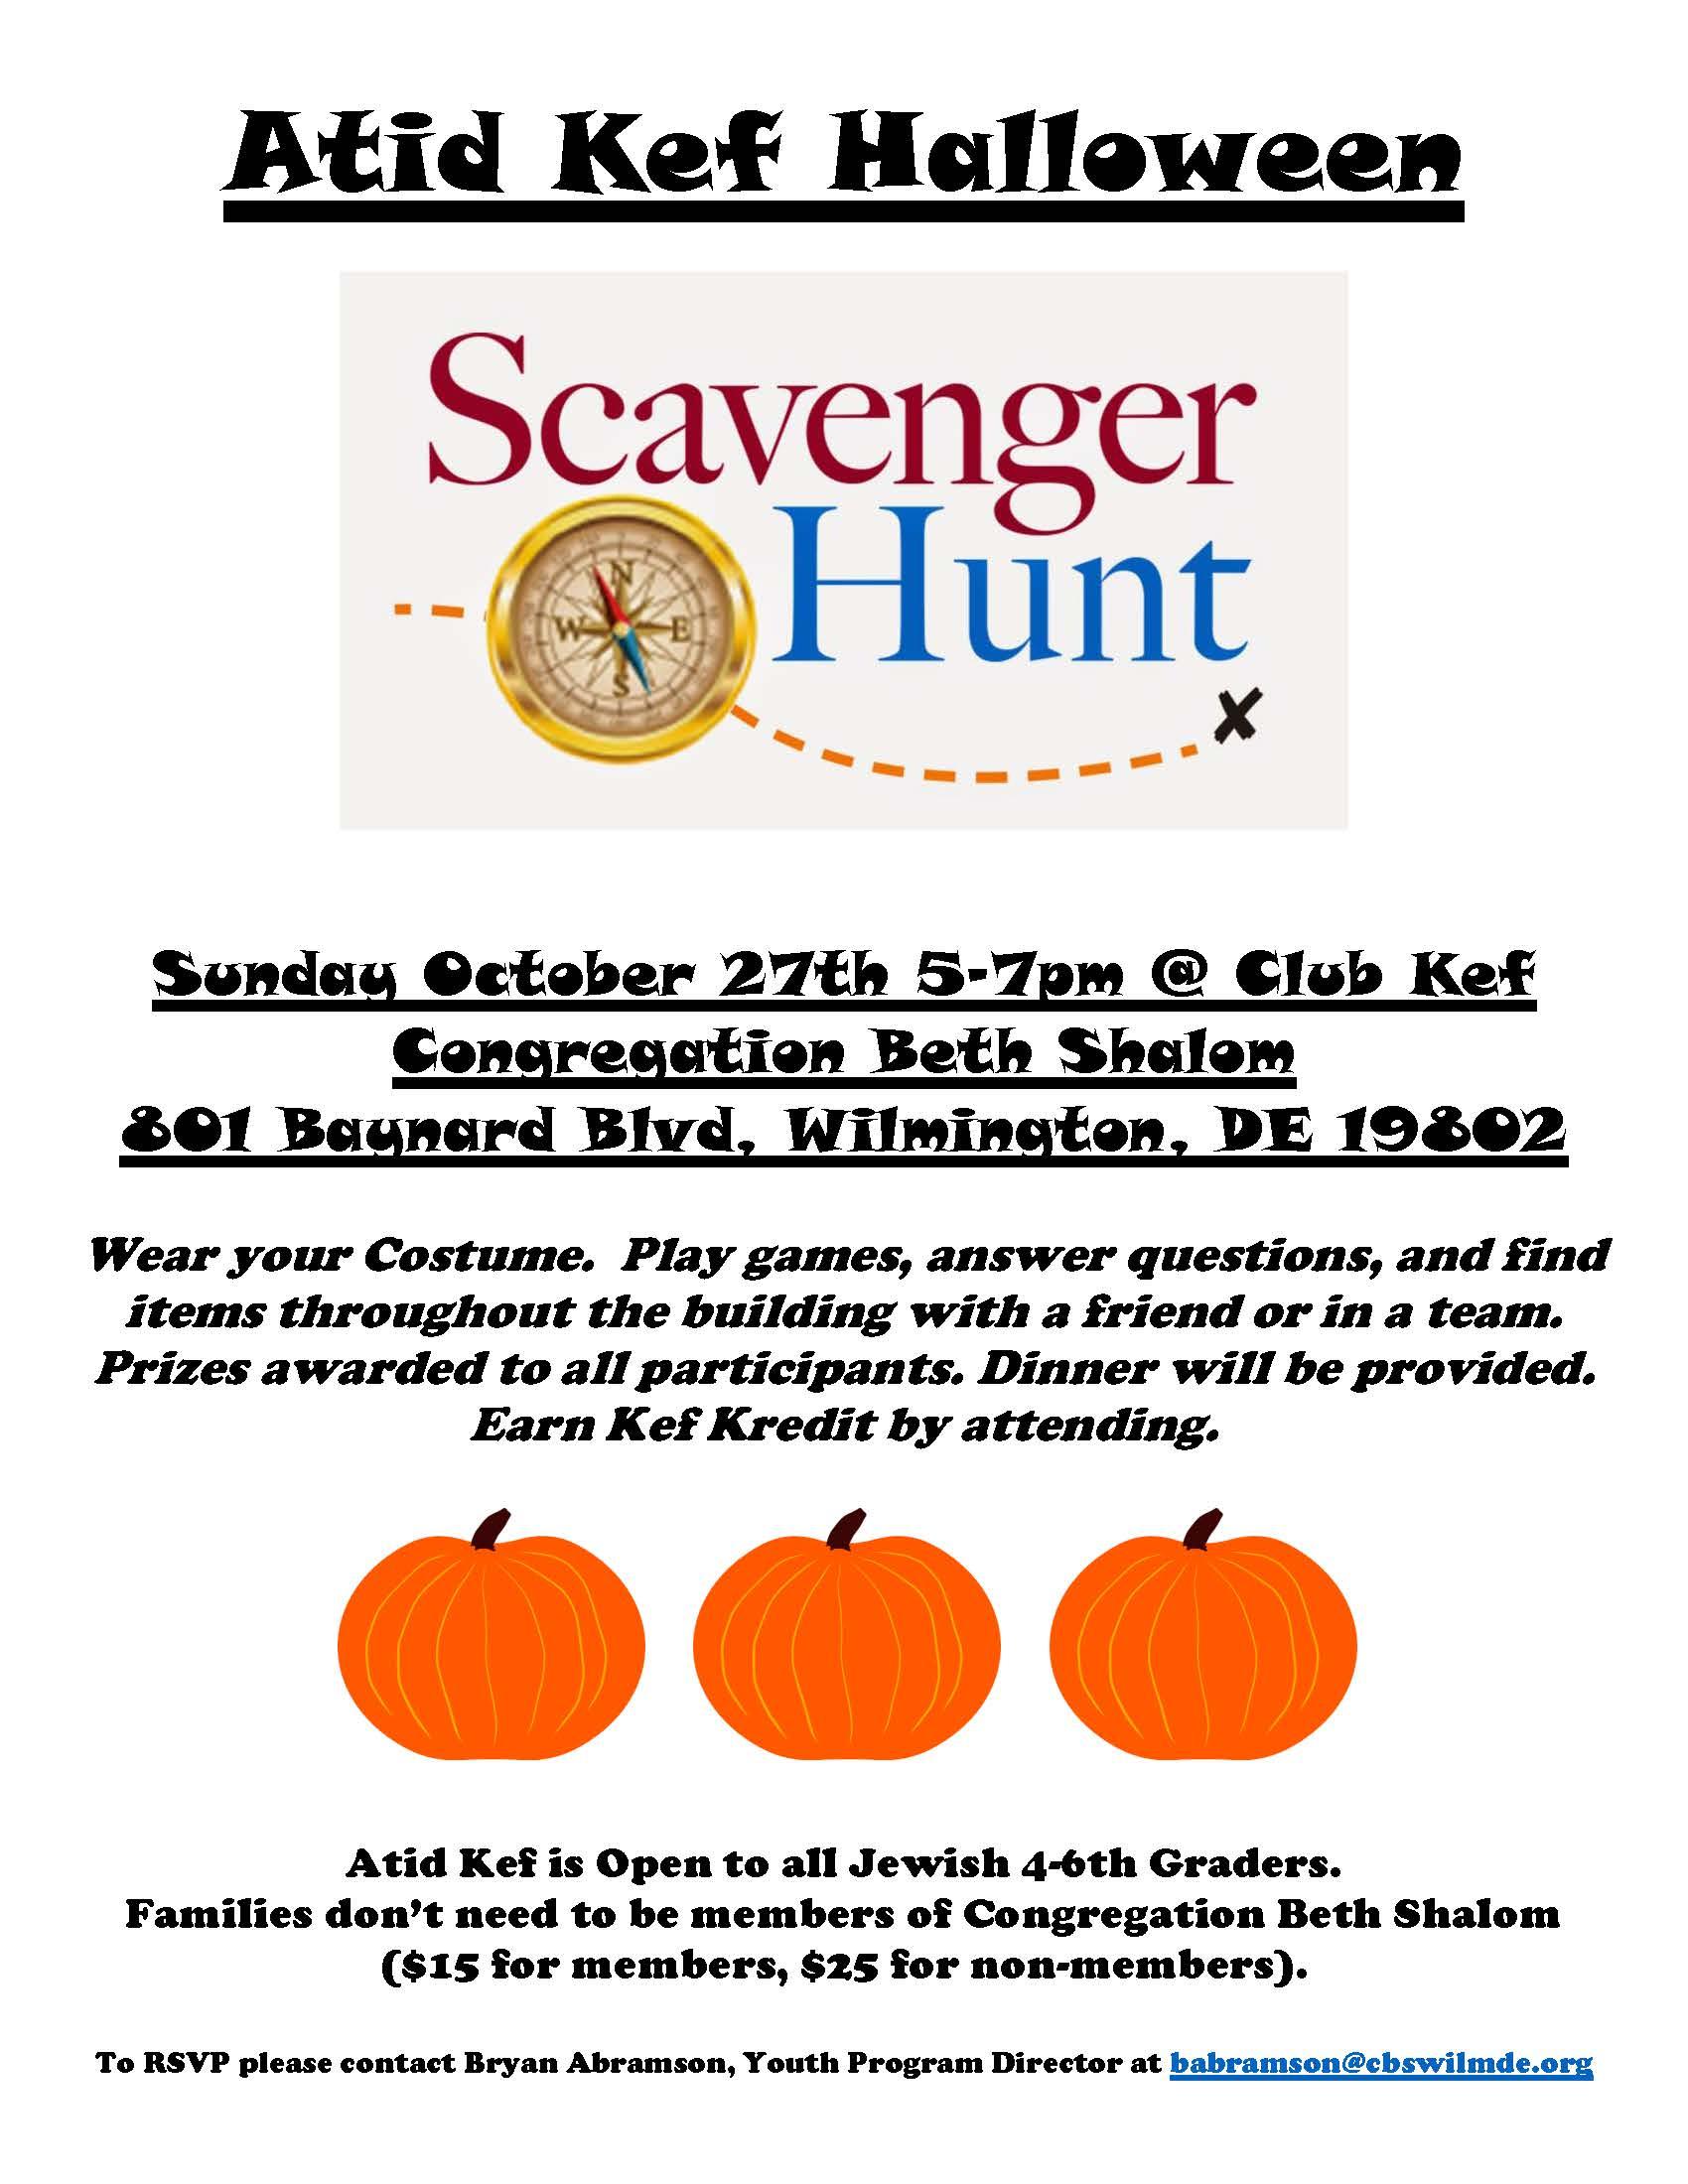 Atid Kef Halloween Scavenger Hunt-Open to all Jewish 4-6th Graders